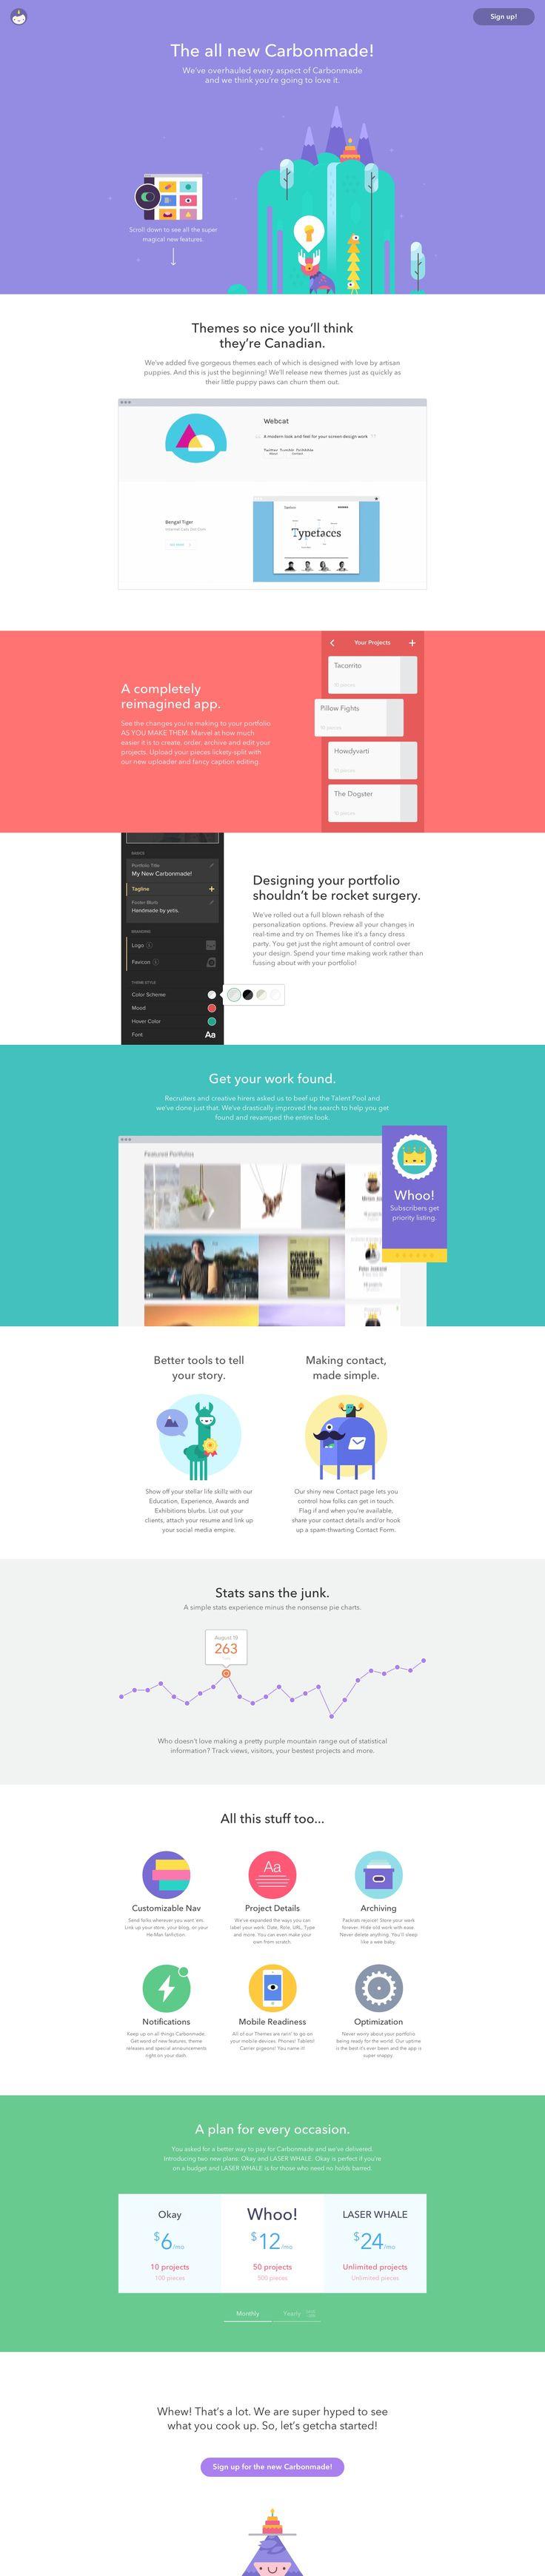 Unique Web Design, Carbonmade #WebDesign #Design #FlatDesign